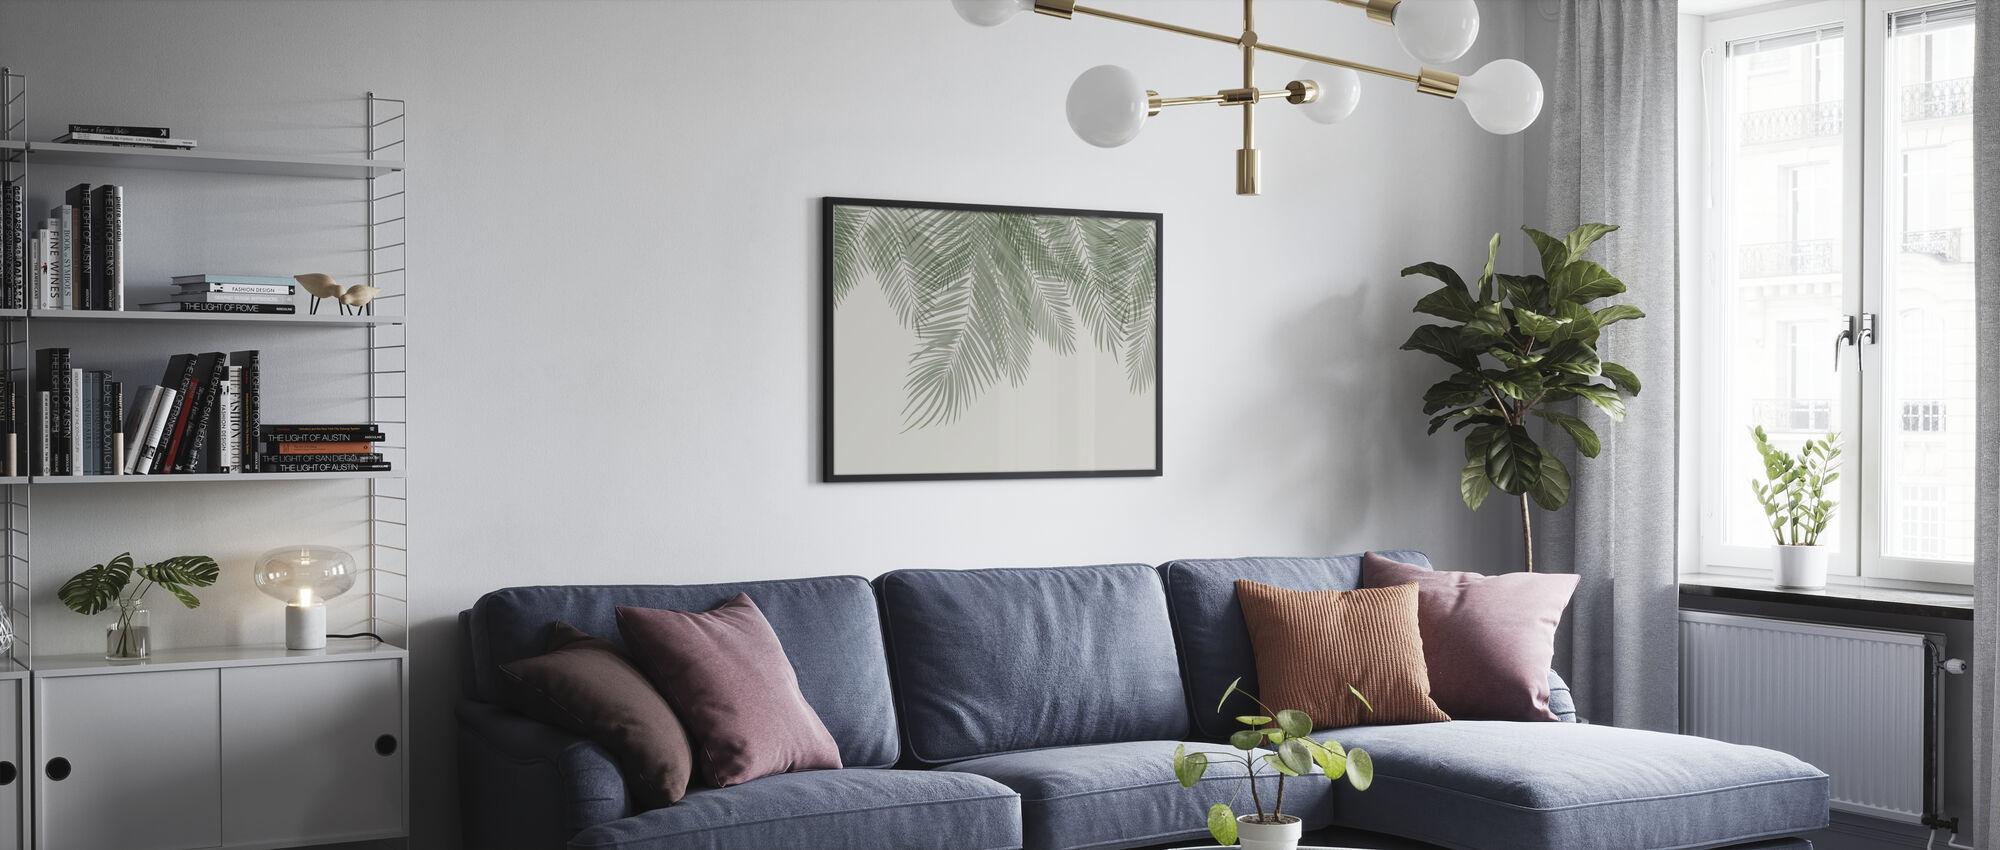 Hanging Palm Leaves - Beige-Green - Poster - Living Room